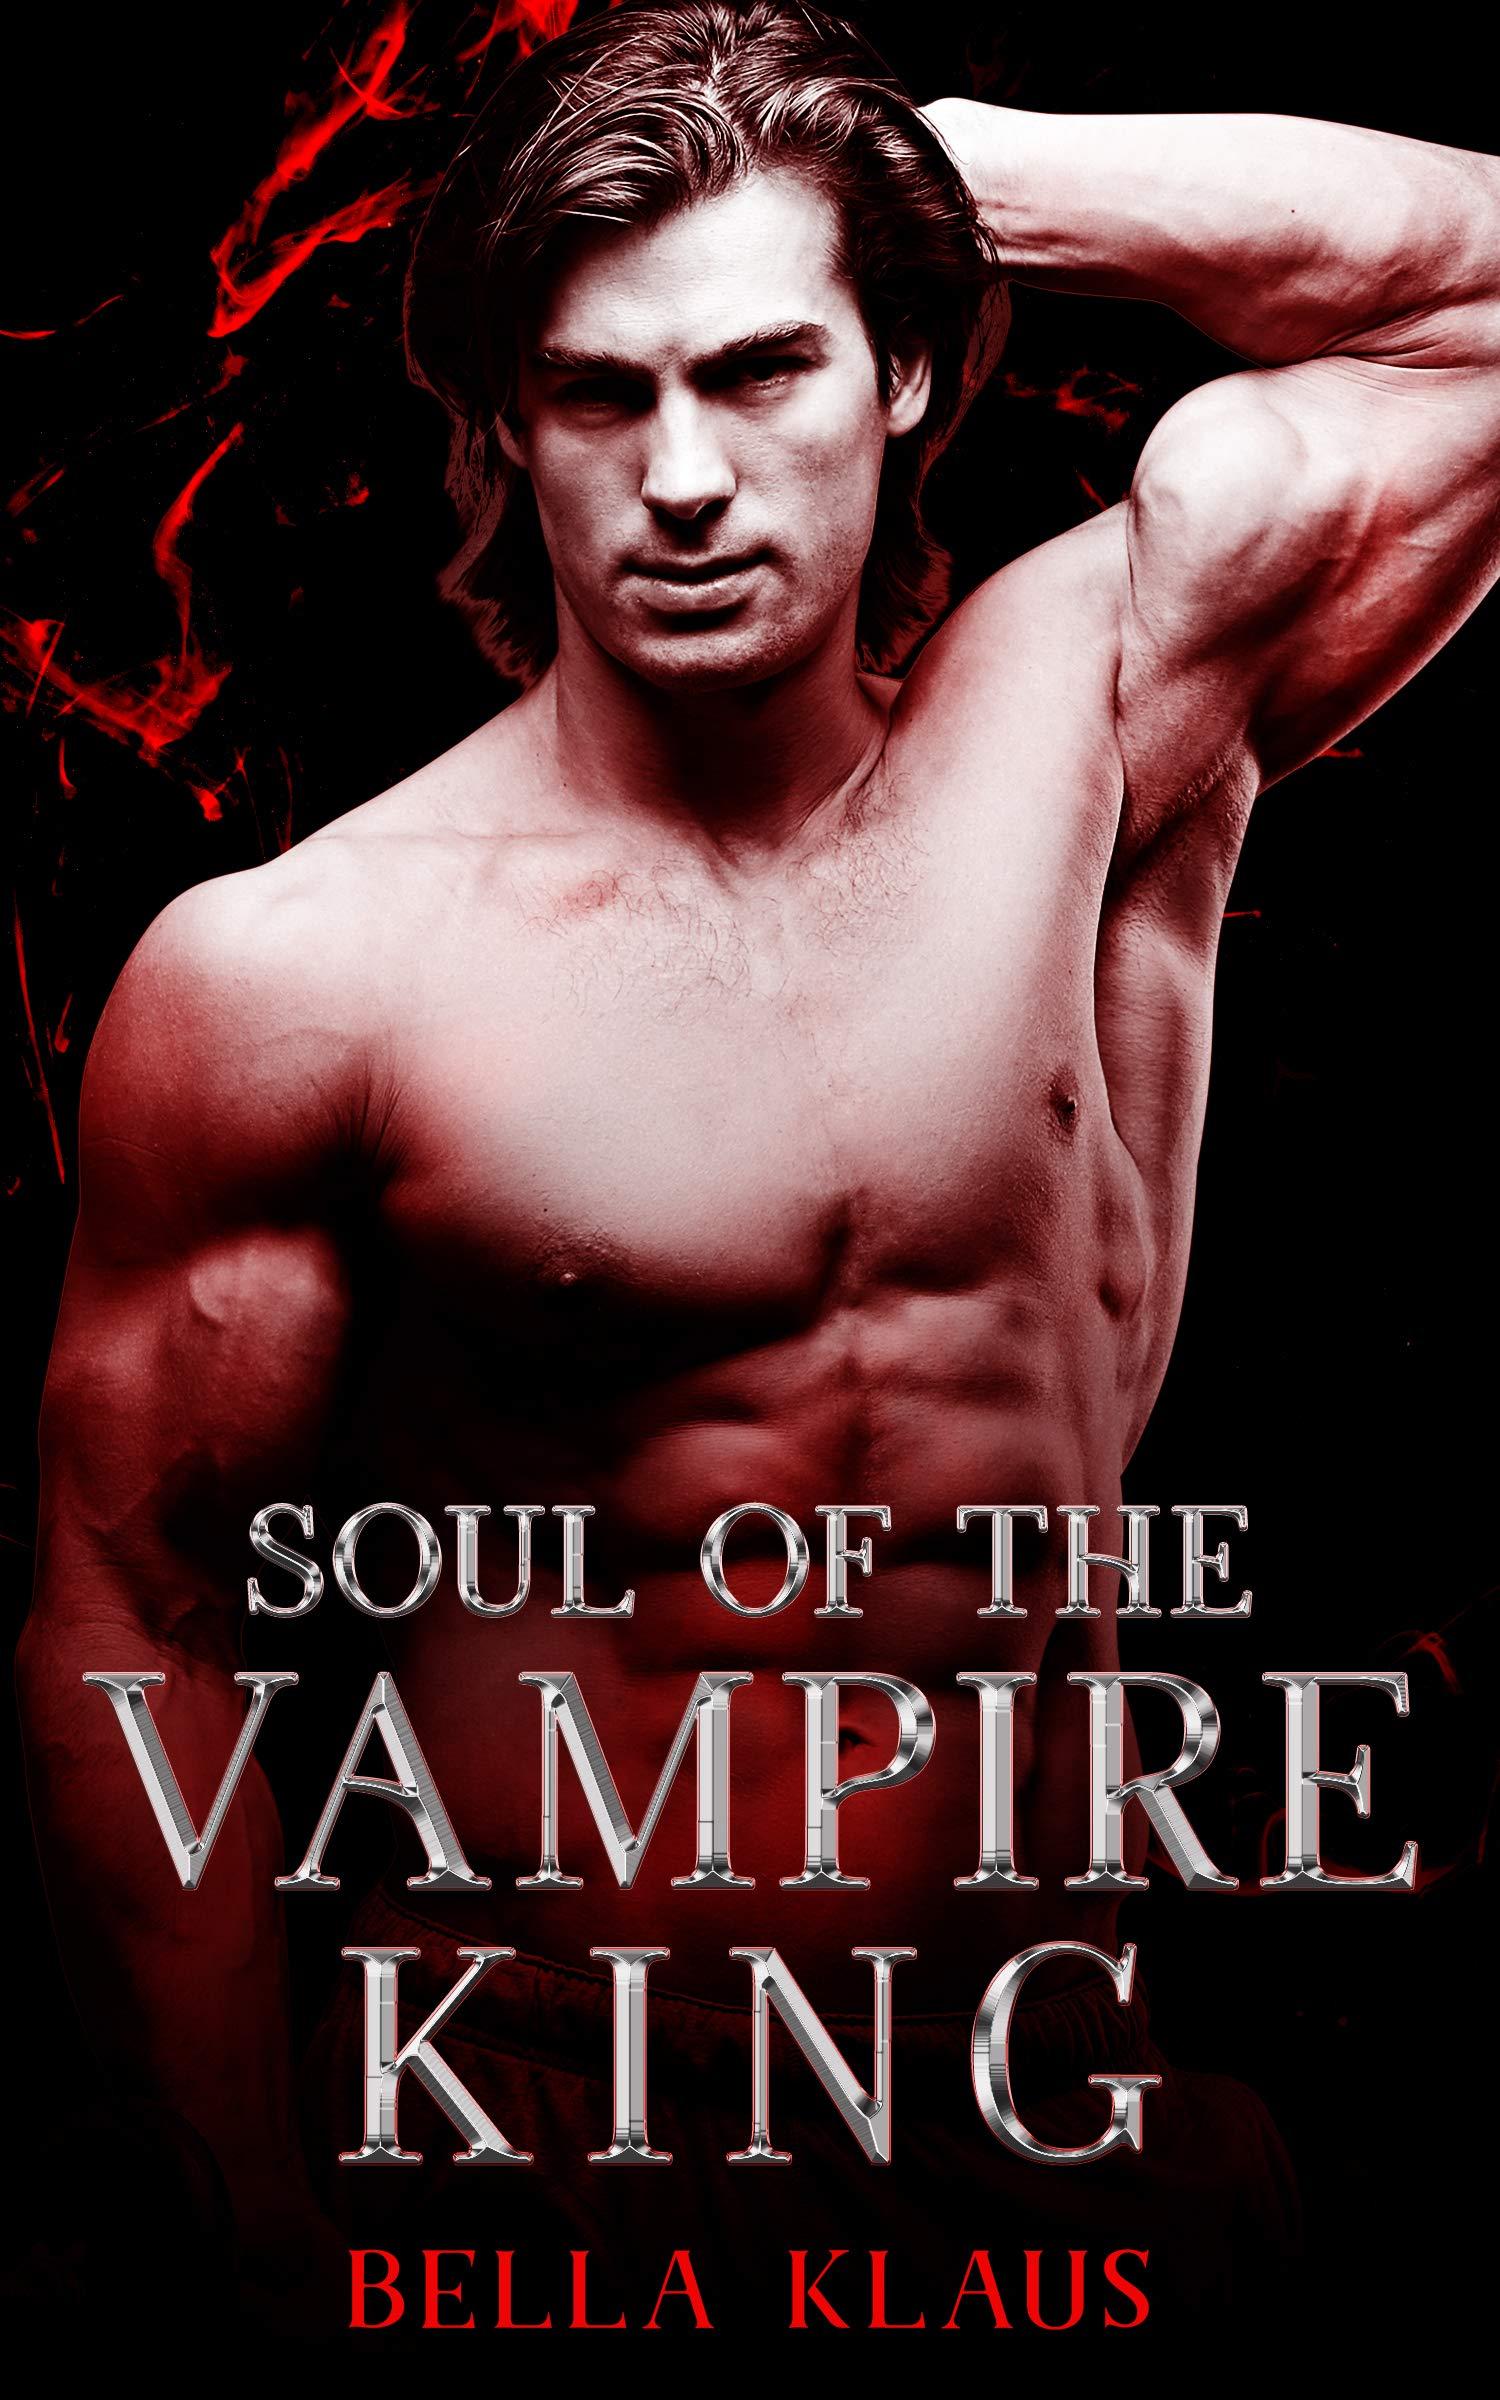 Soul of the Vampire King (Blood Fire Saga, #3)